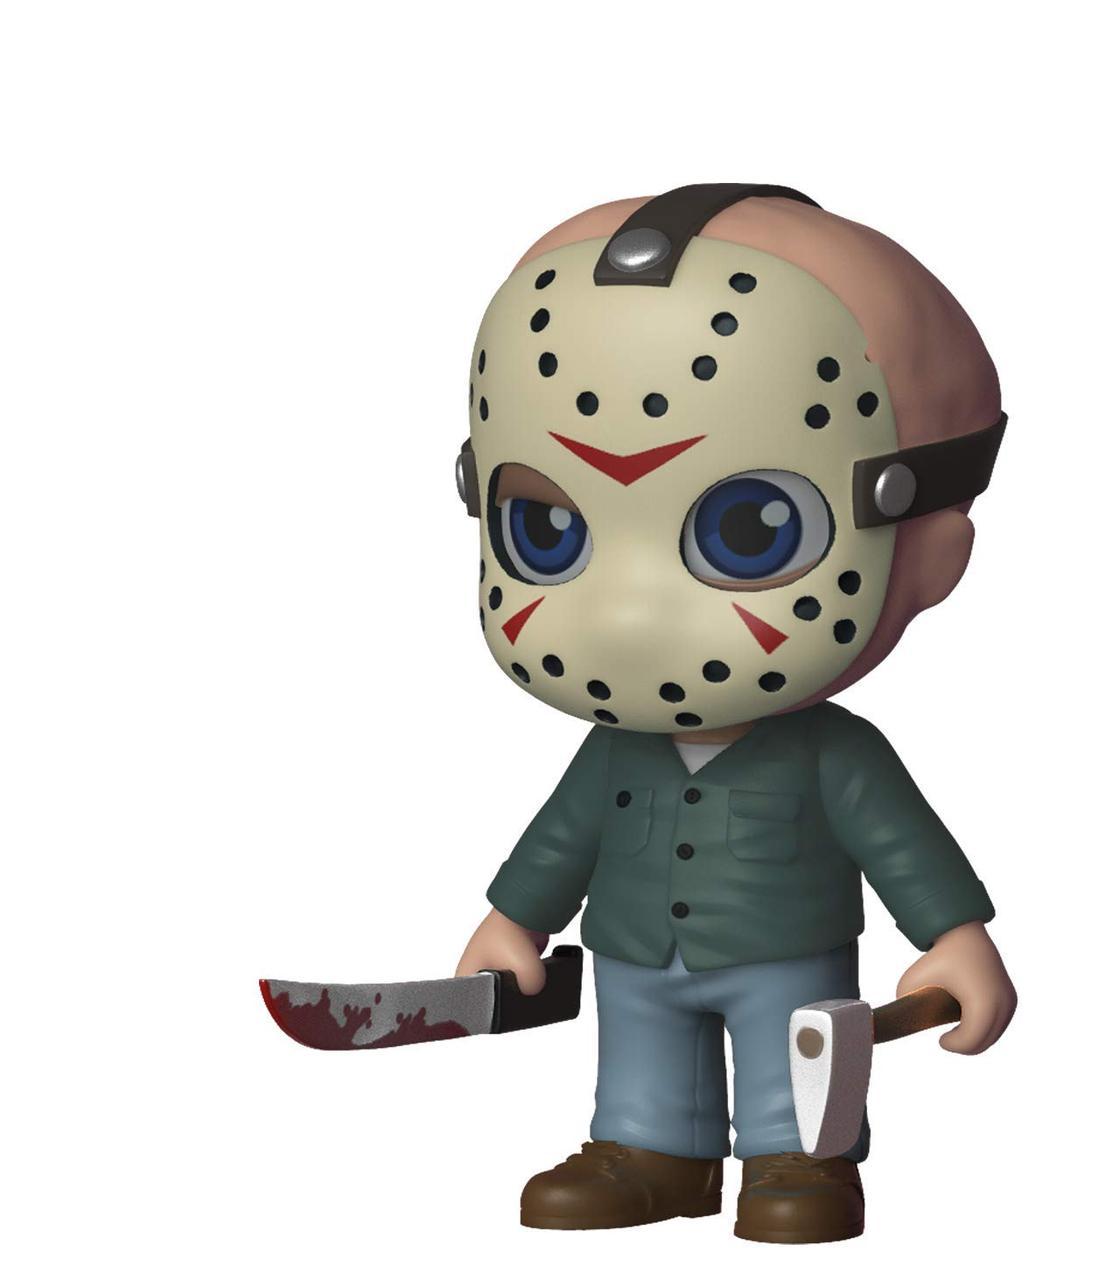 Фигурка Funko 5 Star: Horror, Friday The 13Th Jason Voorhees Джейсон Вурхис